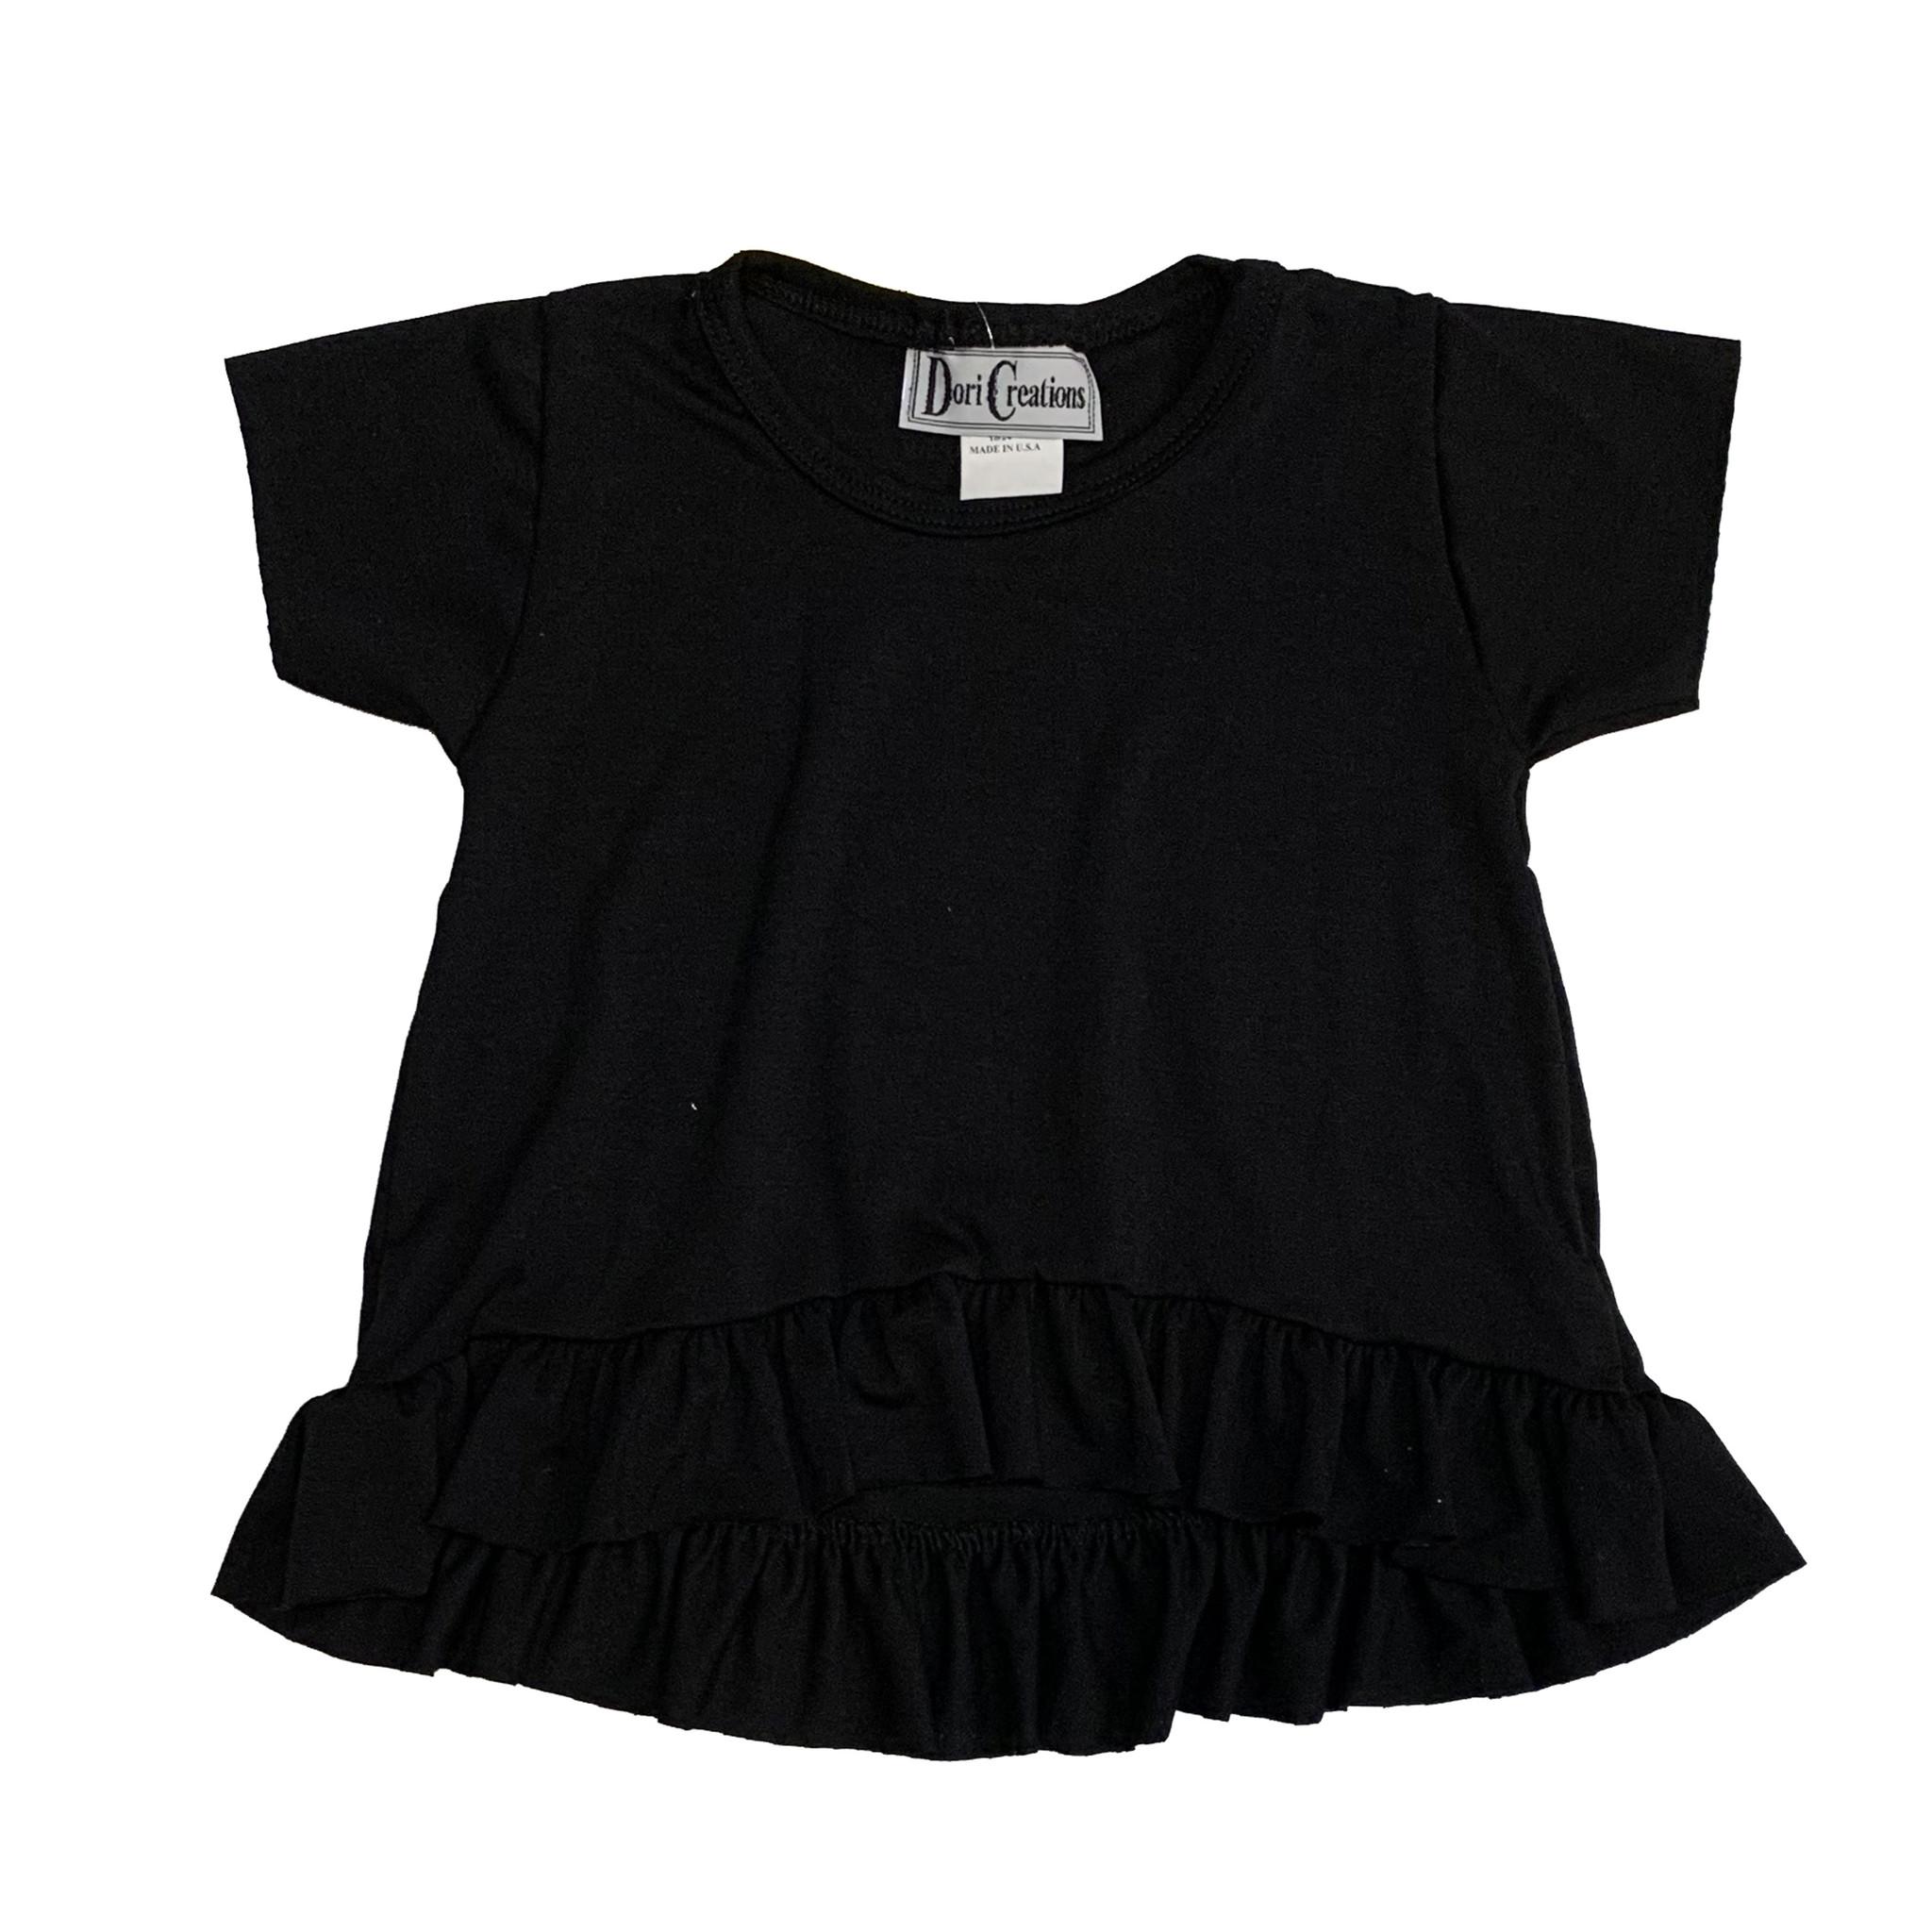 Dori Creations Black Ruffle Infant Tee